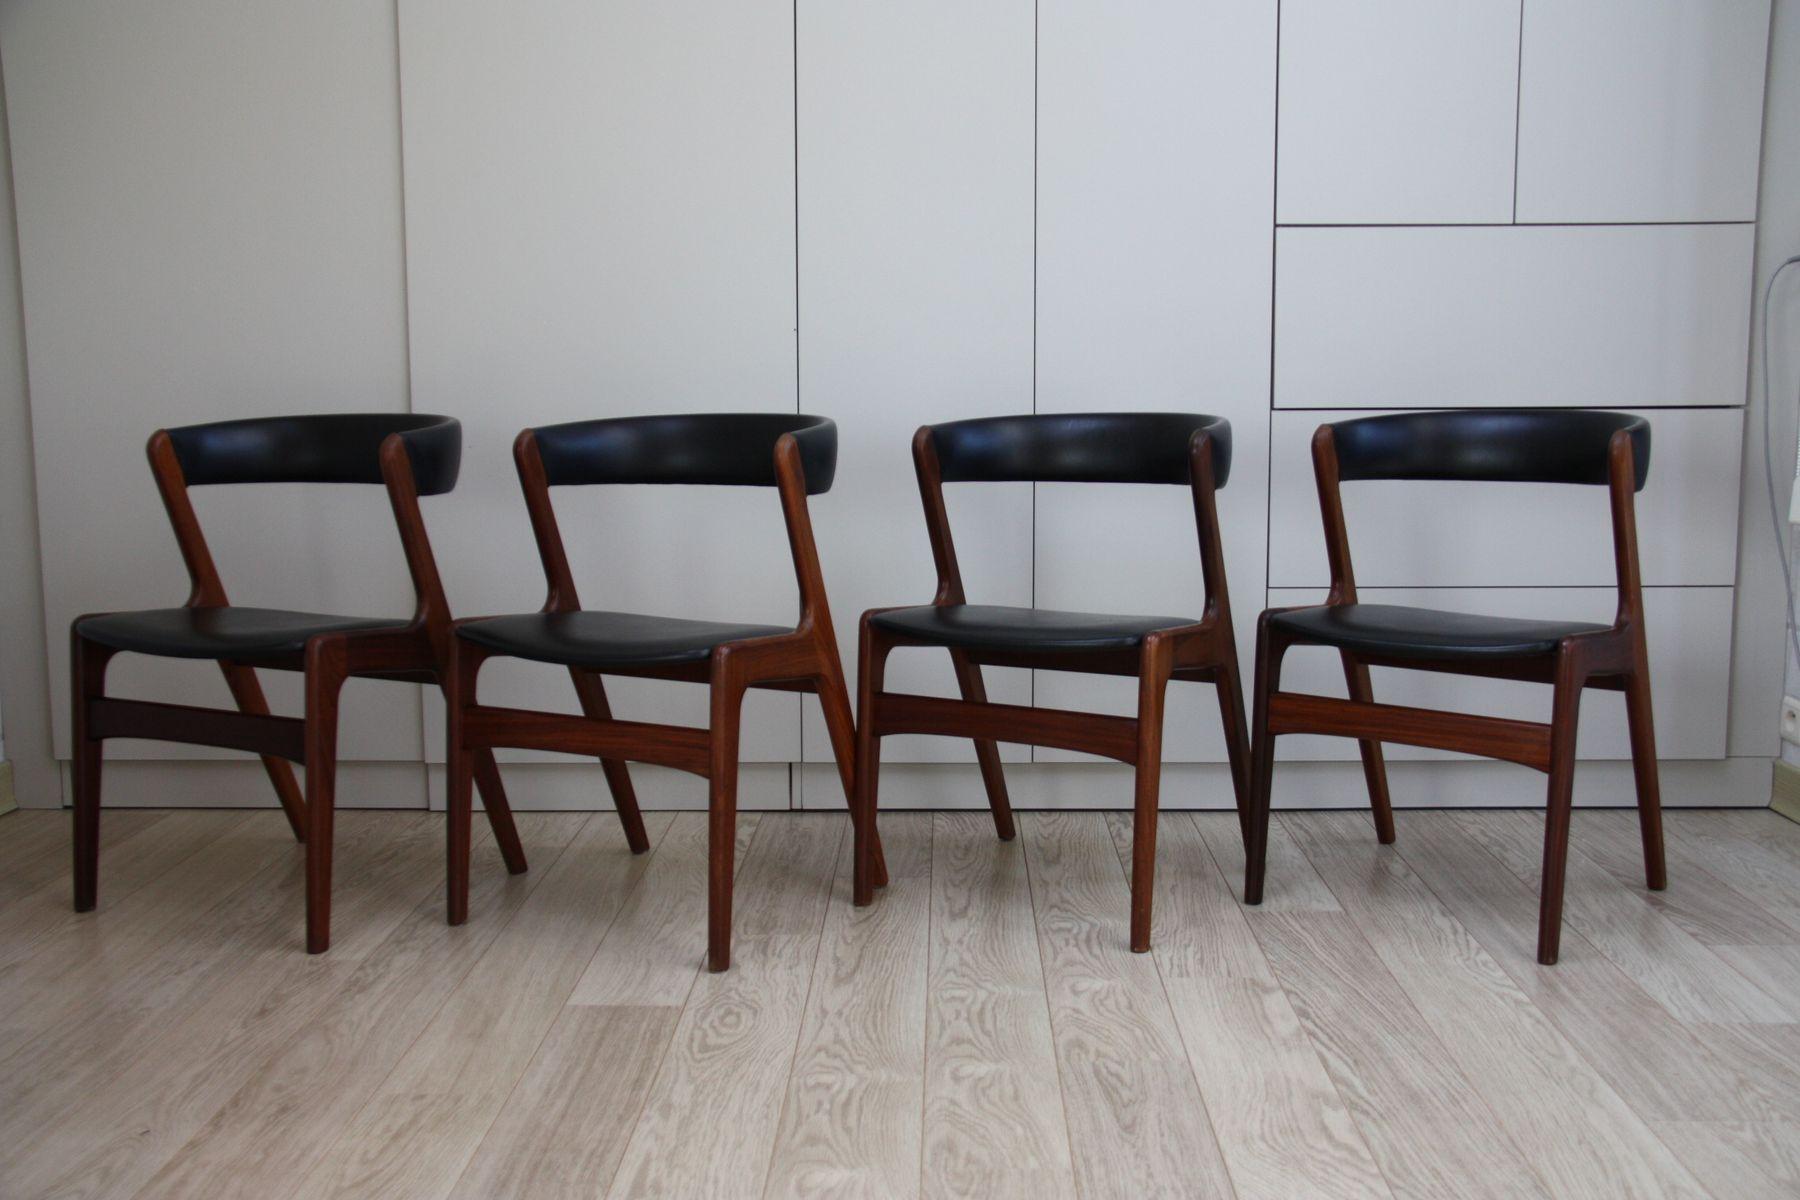 Table de salle manger vintage rallonge et 4 chaises en for Salle a manger 1950